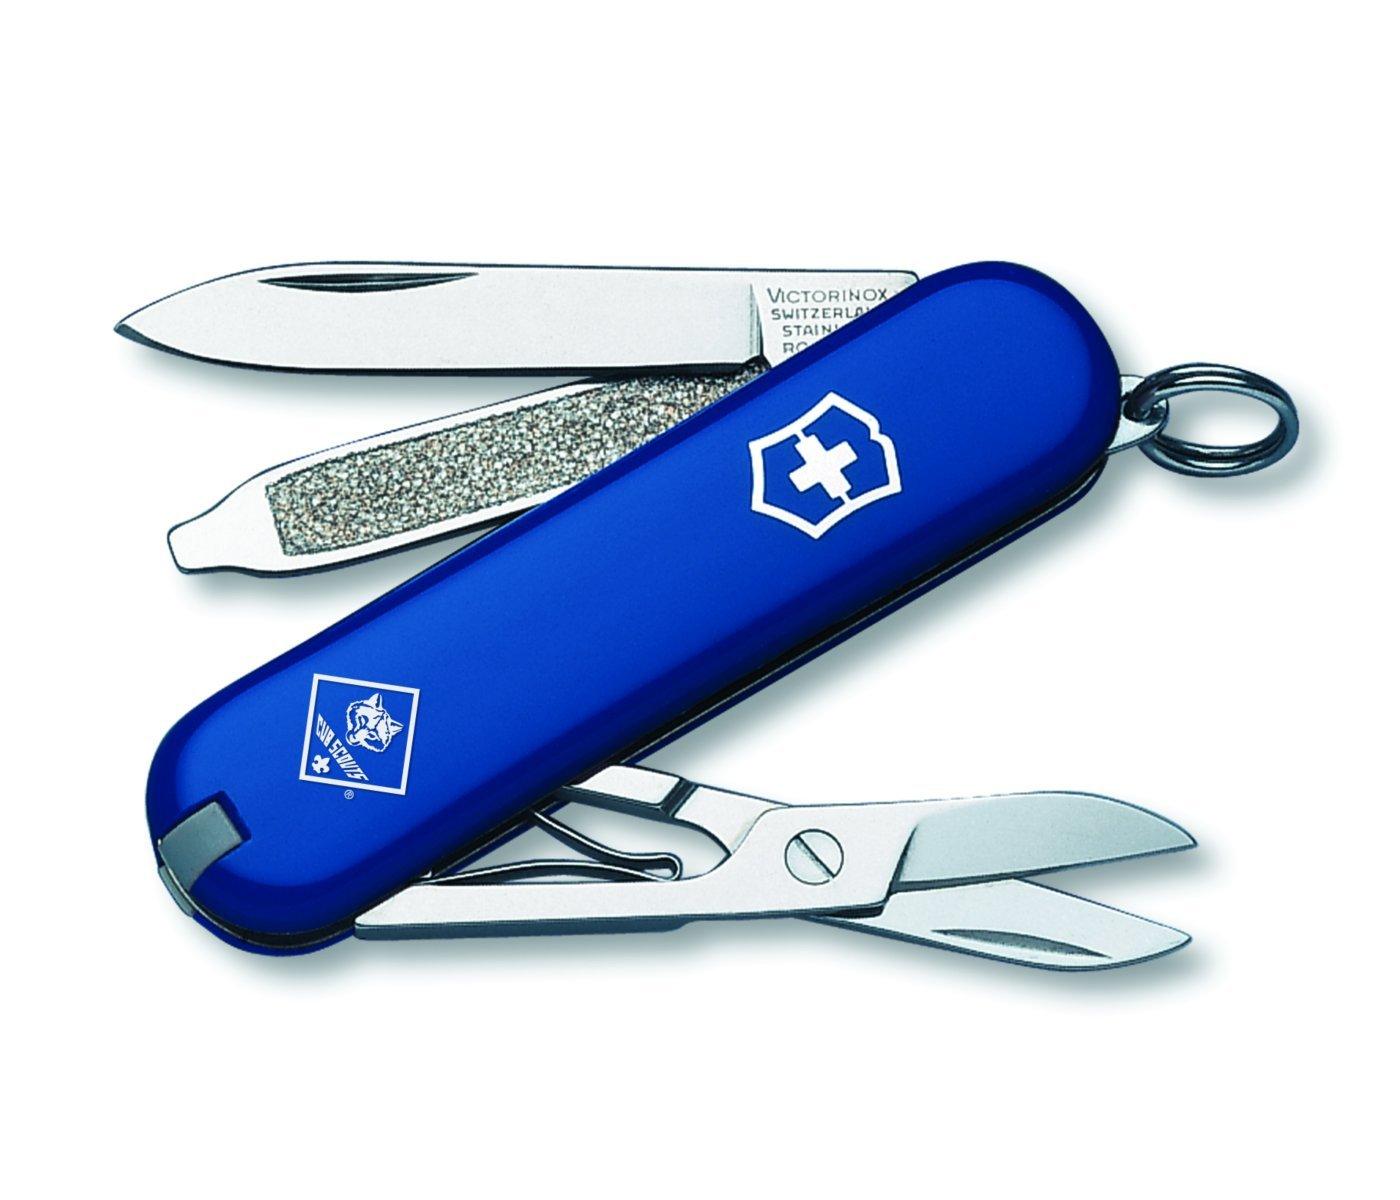 Victorinox Swiss Army Classic SD Cub Scout Pocket Knife, Blue by Victorinox Swiss Army